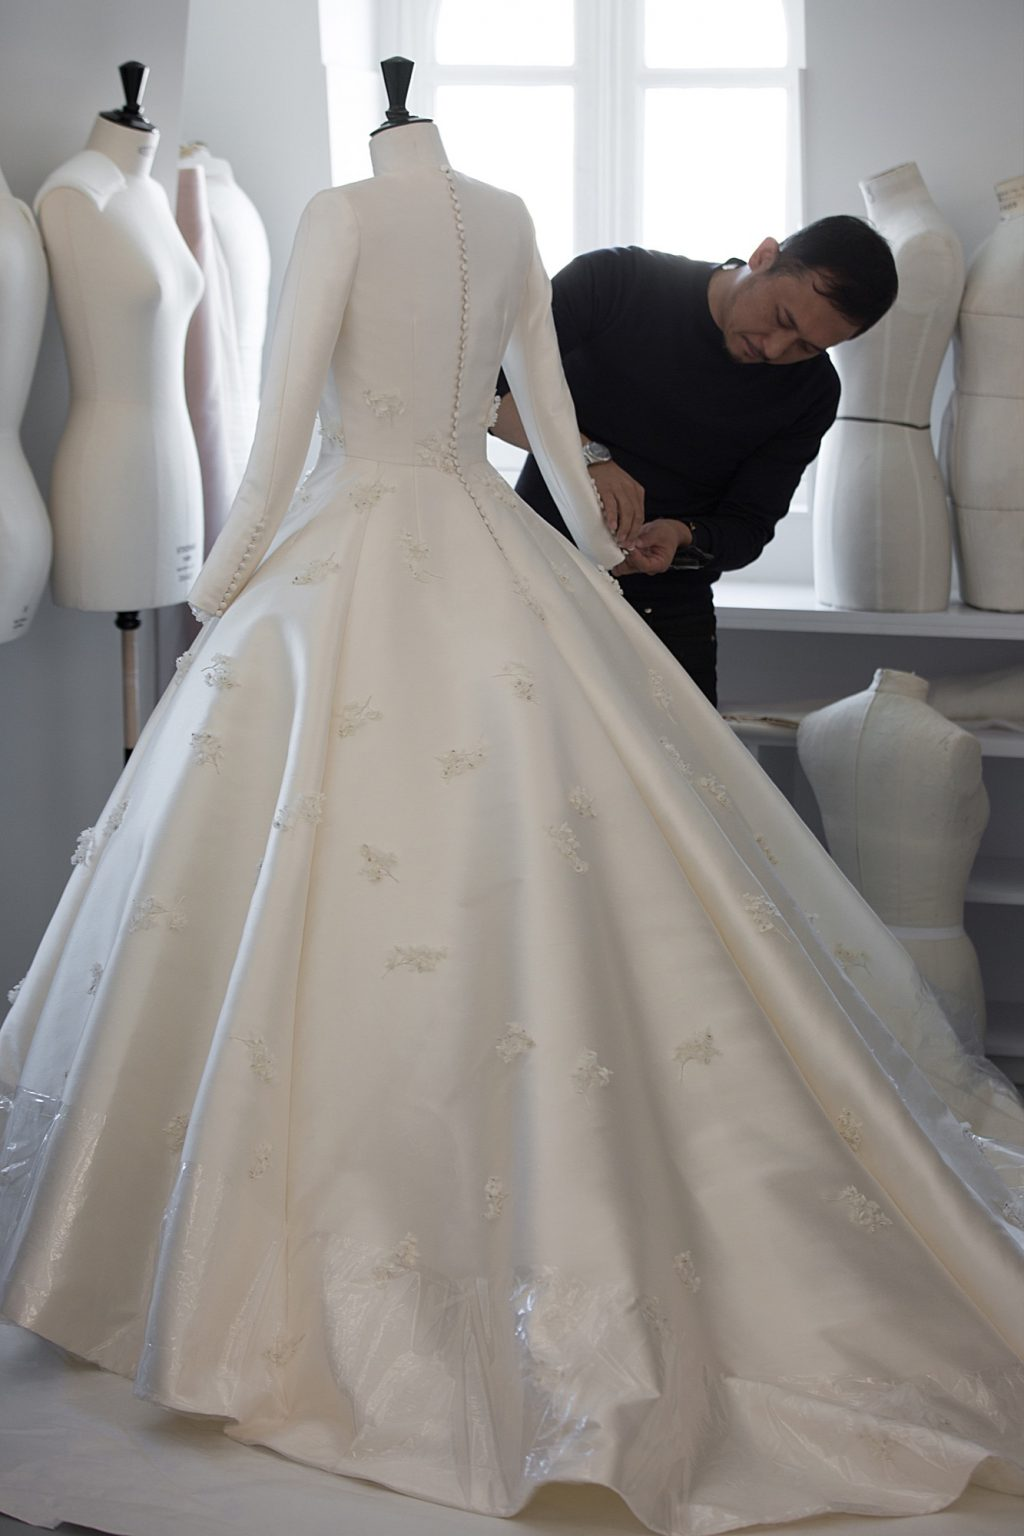 Dior Wedding Gown Prices Iucn Water